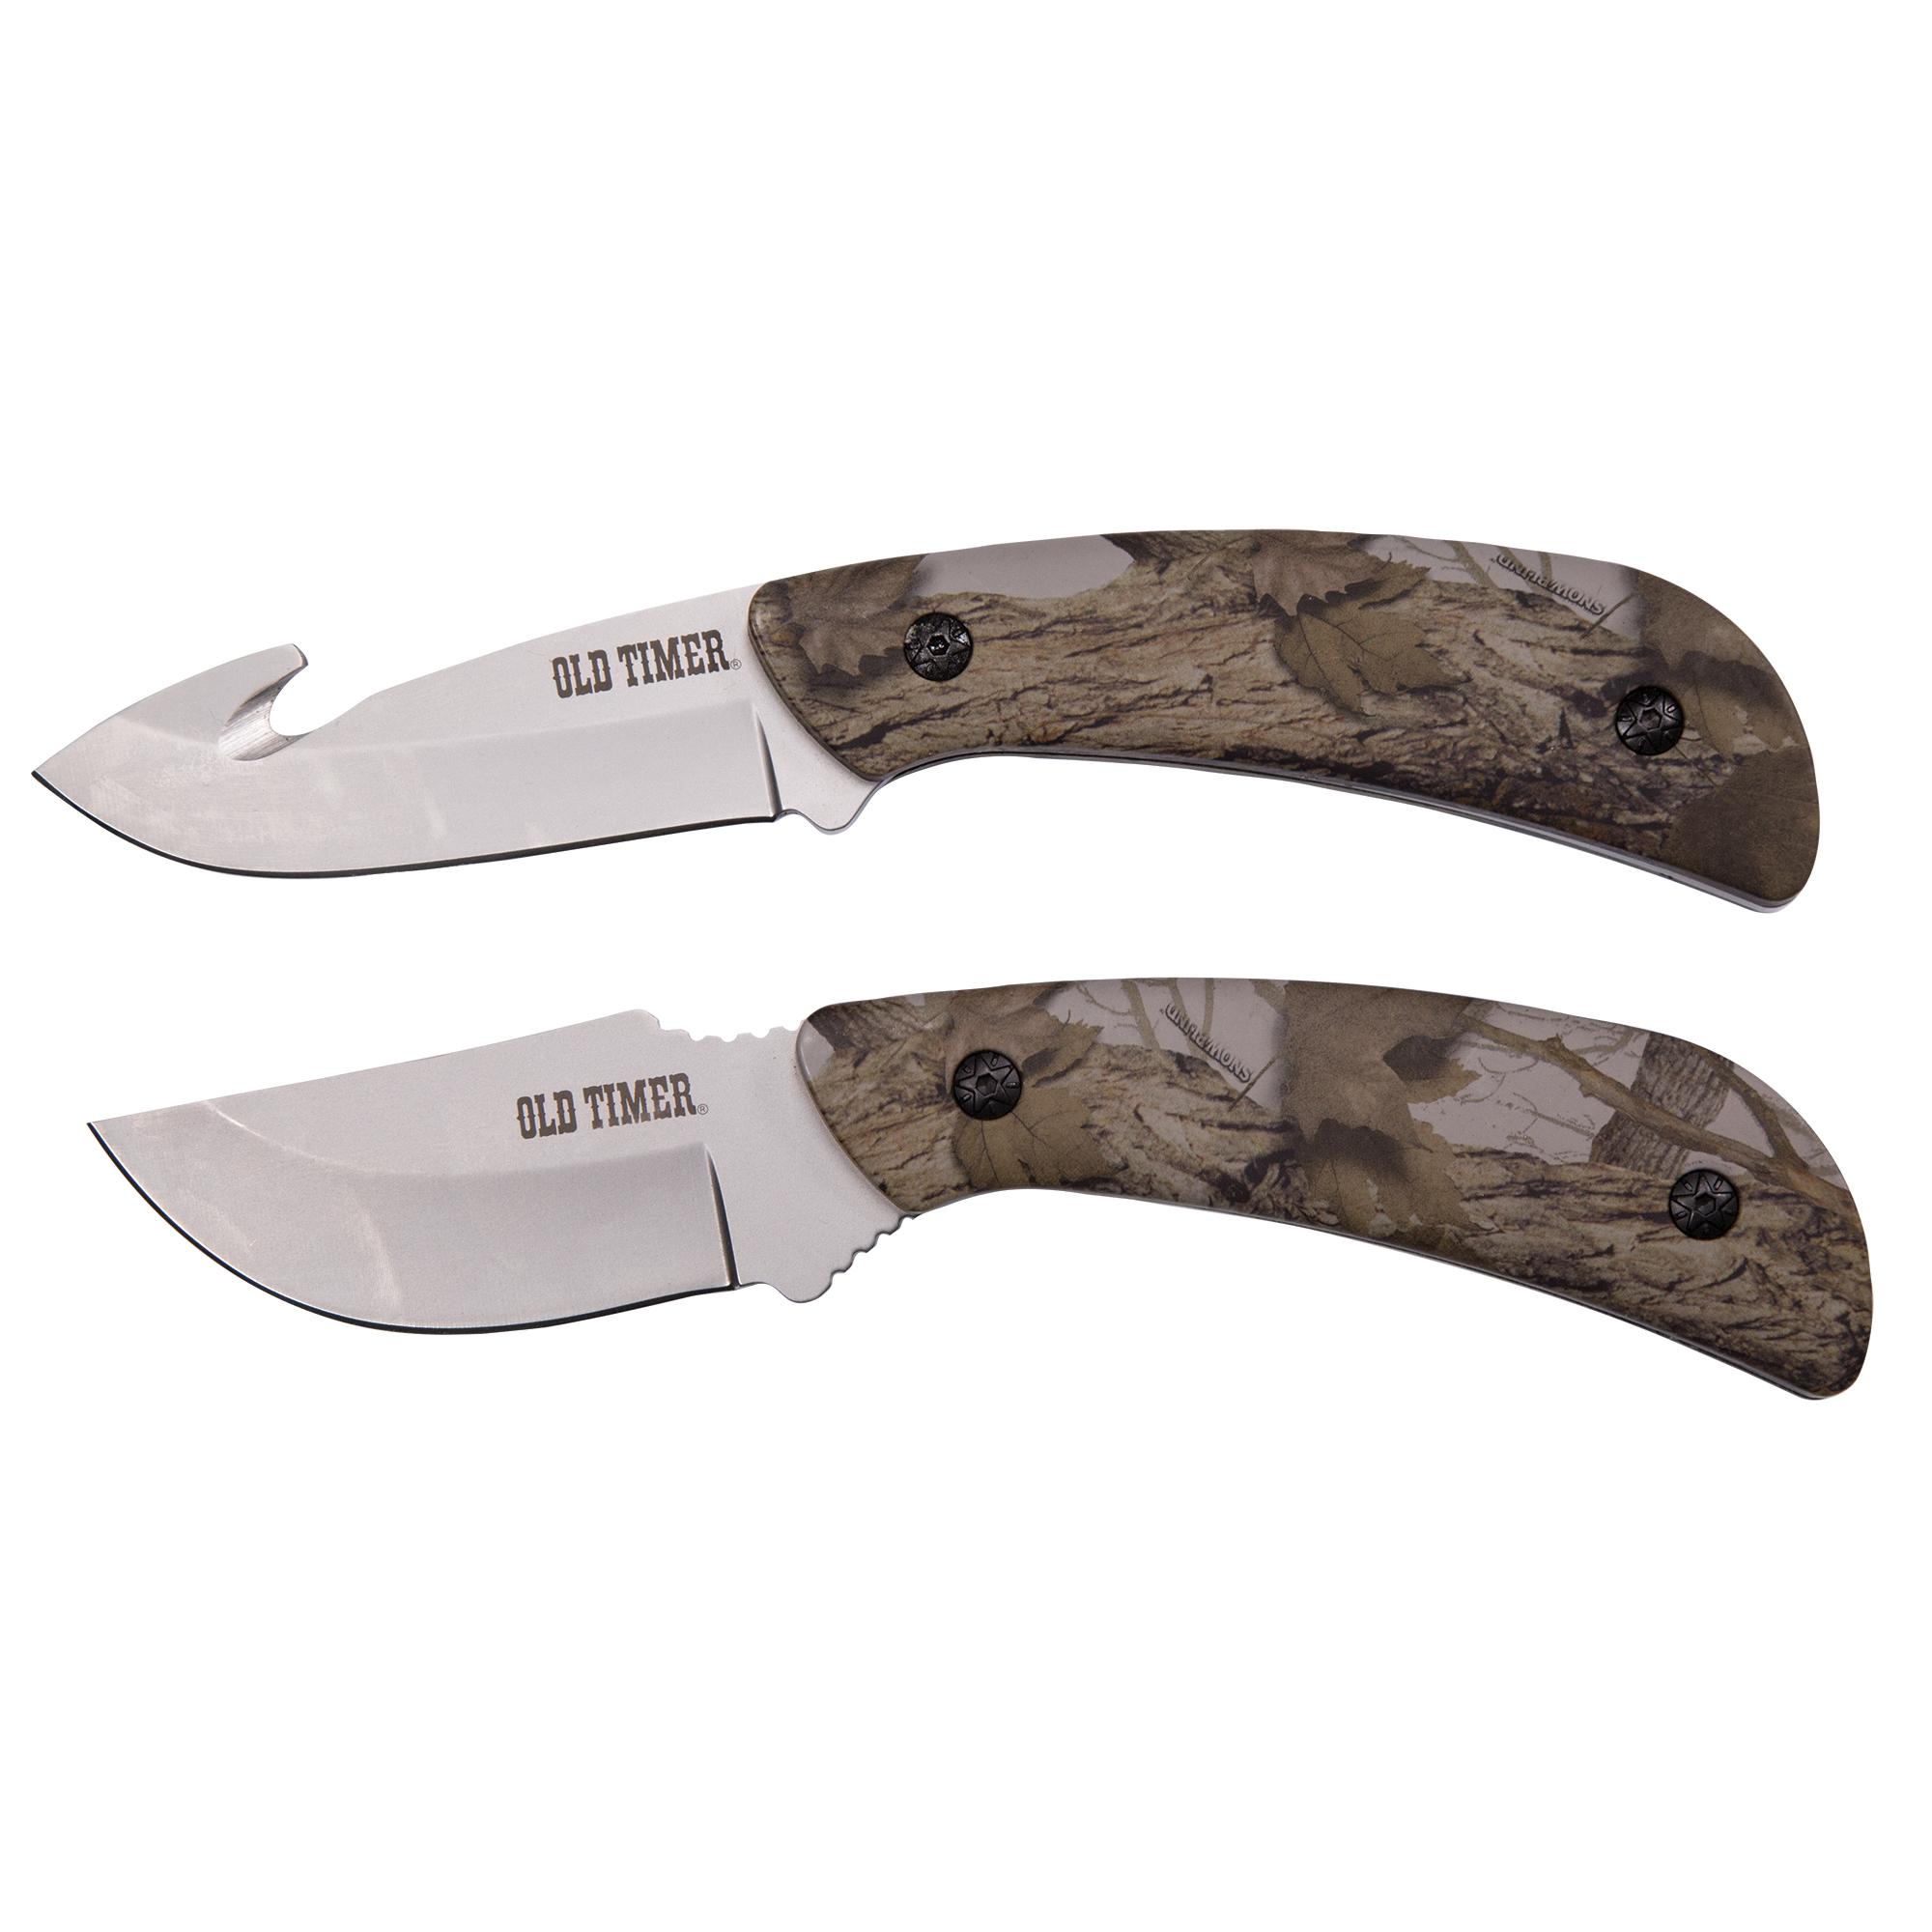 Old Timer Snowblind Fixed Knife 2-Pack